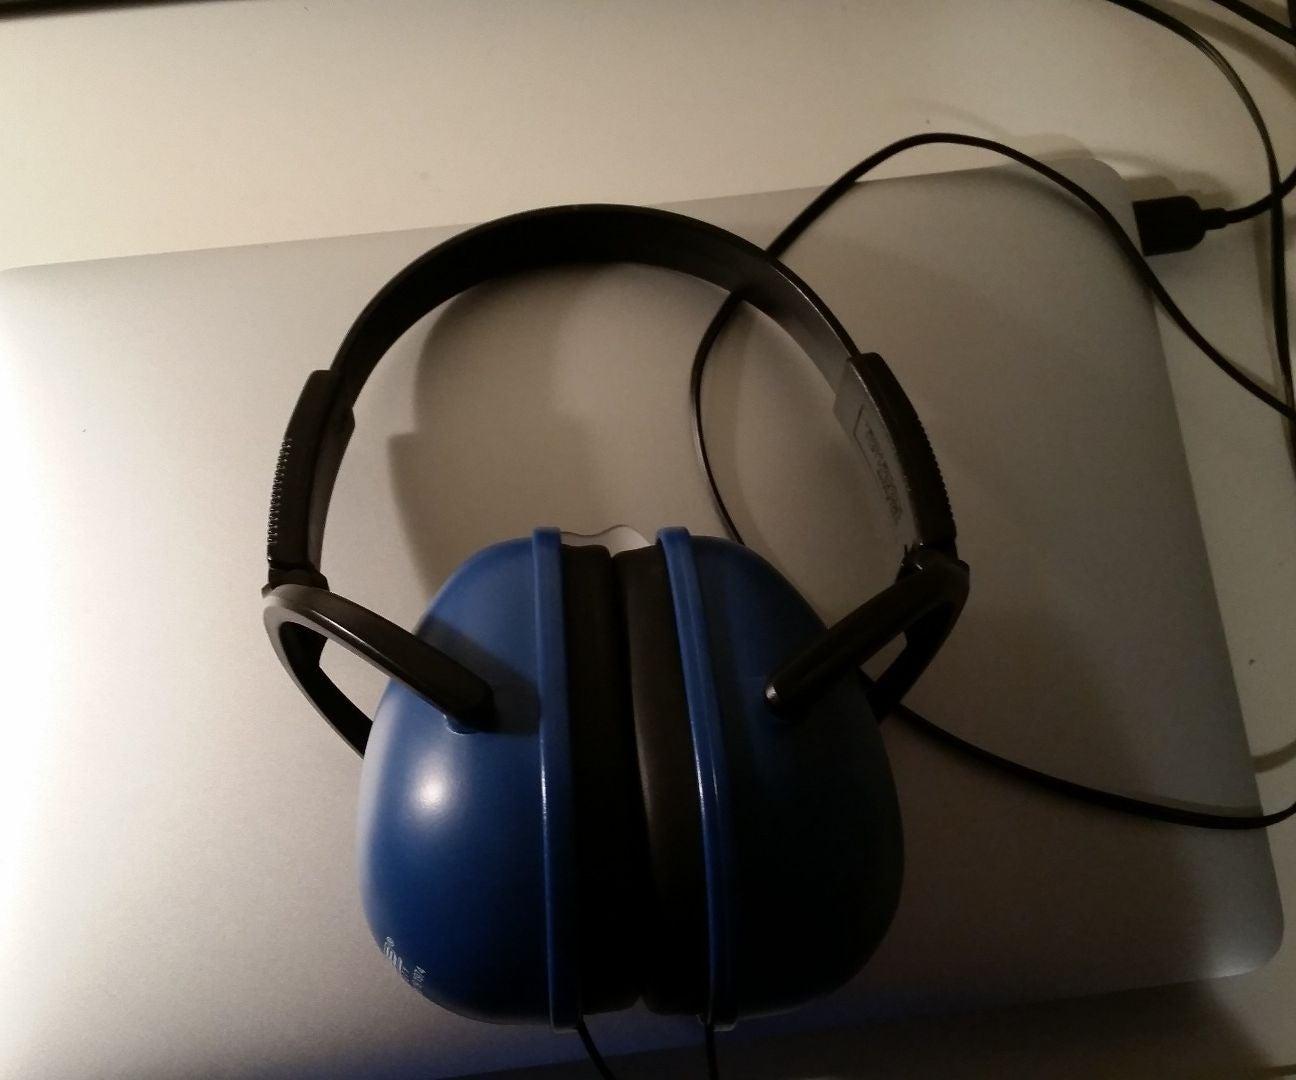 DYI Noise-cancelling Headphones